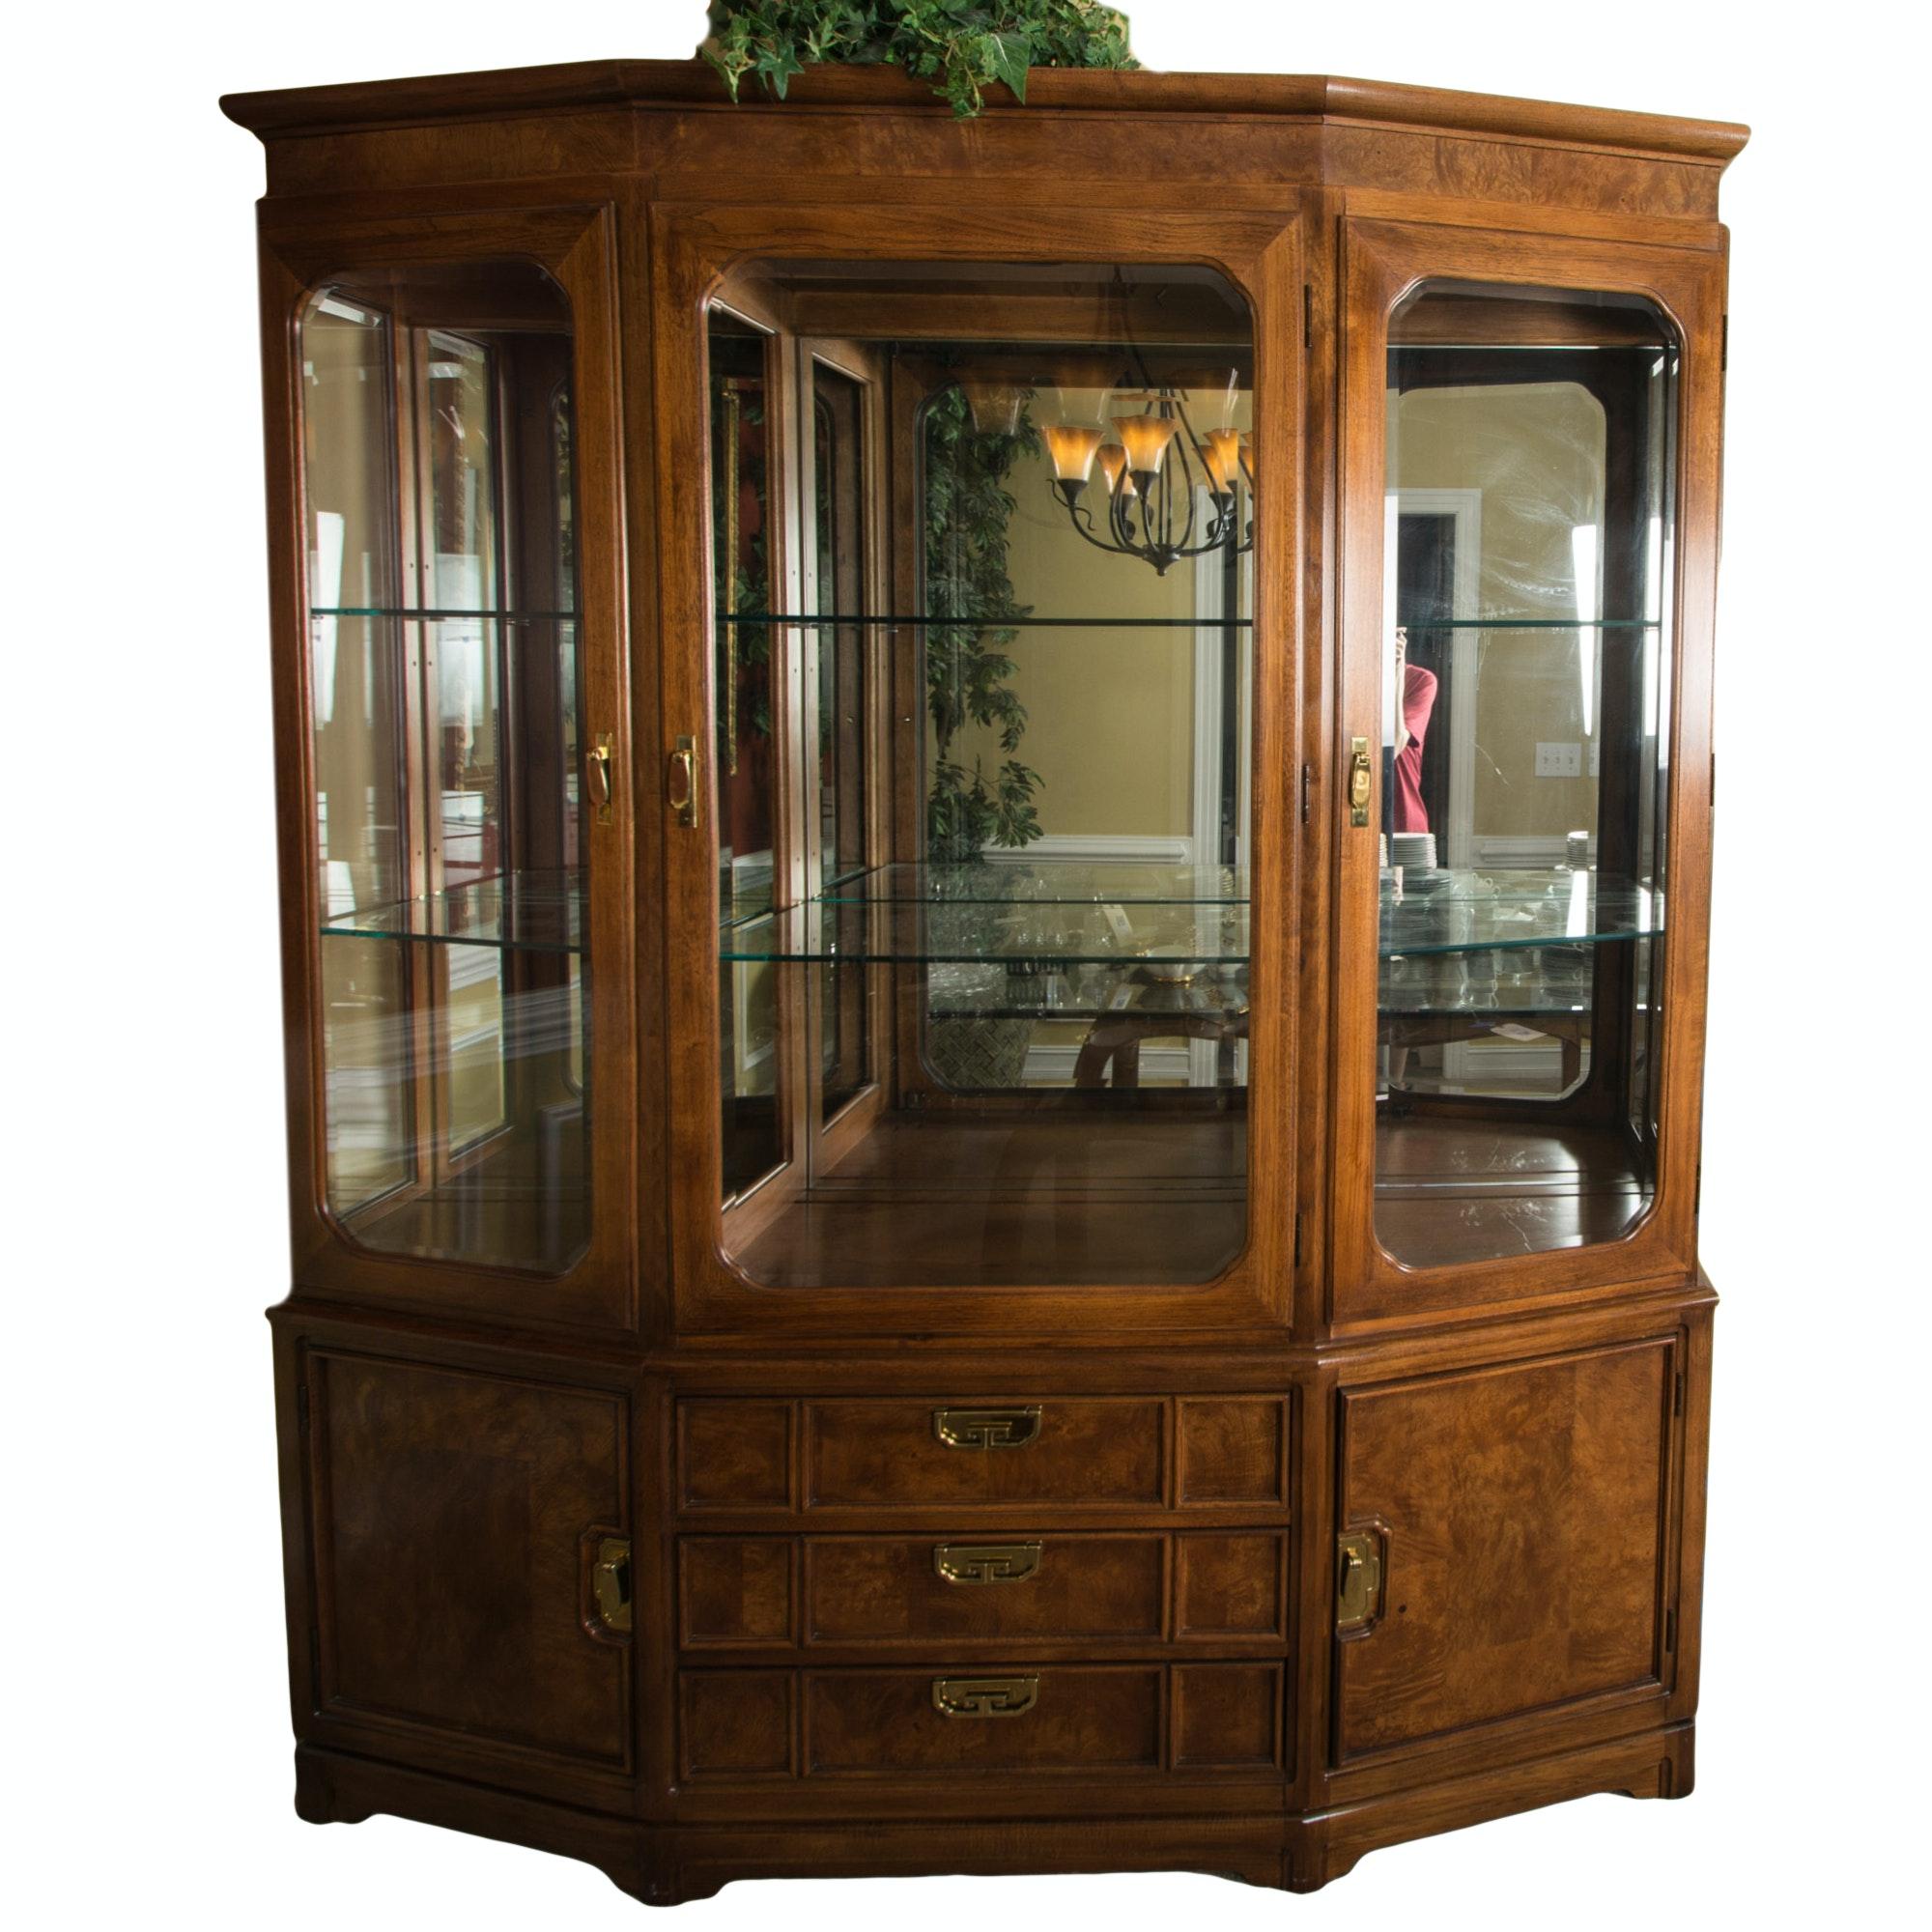 Thomasville kitchen cabinet